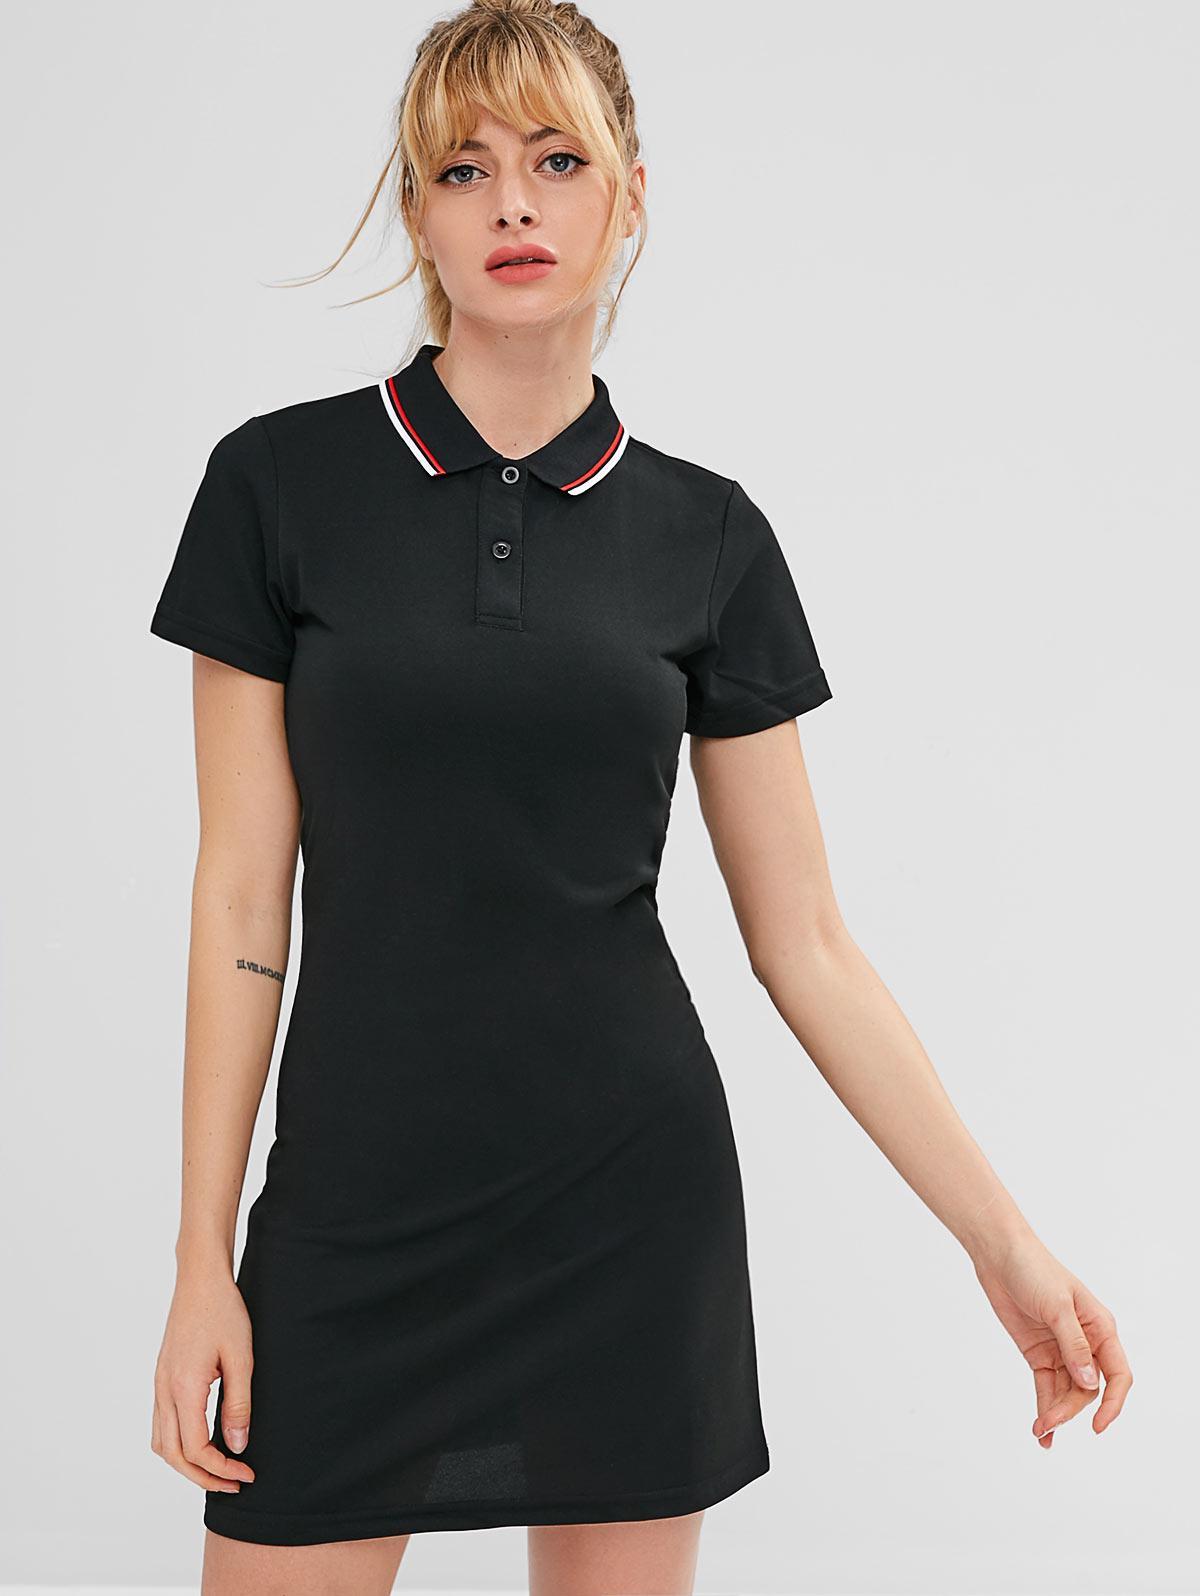 ZAFUL Mini Athletic Dress, Black